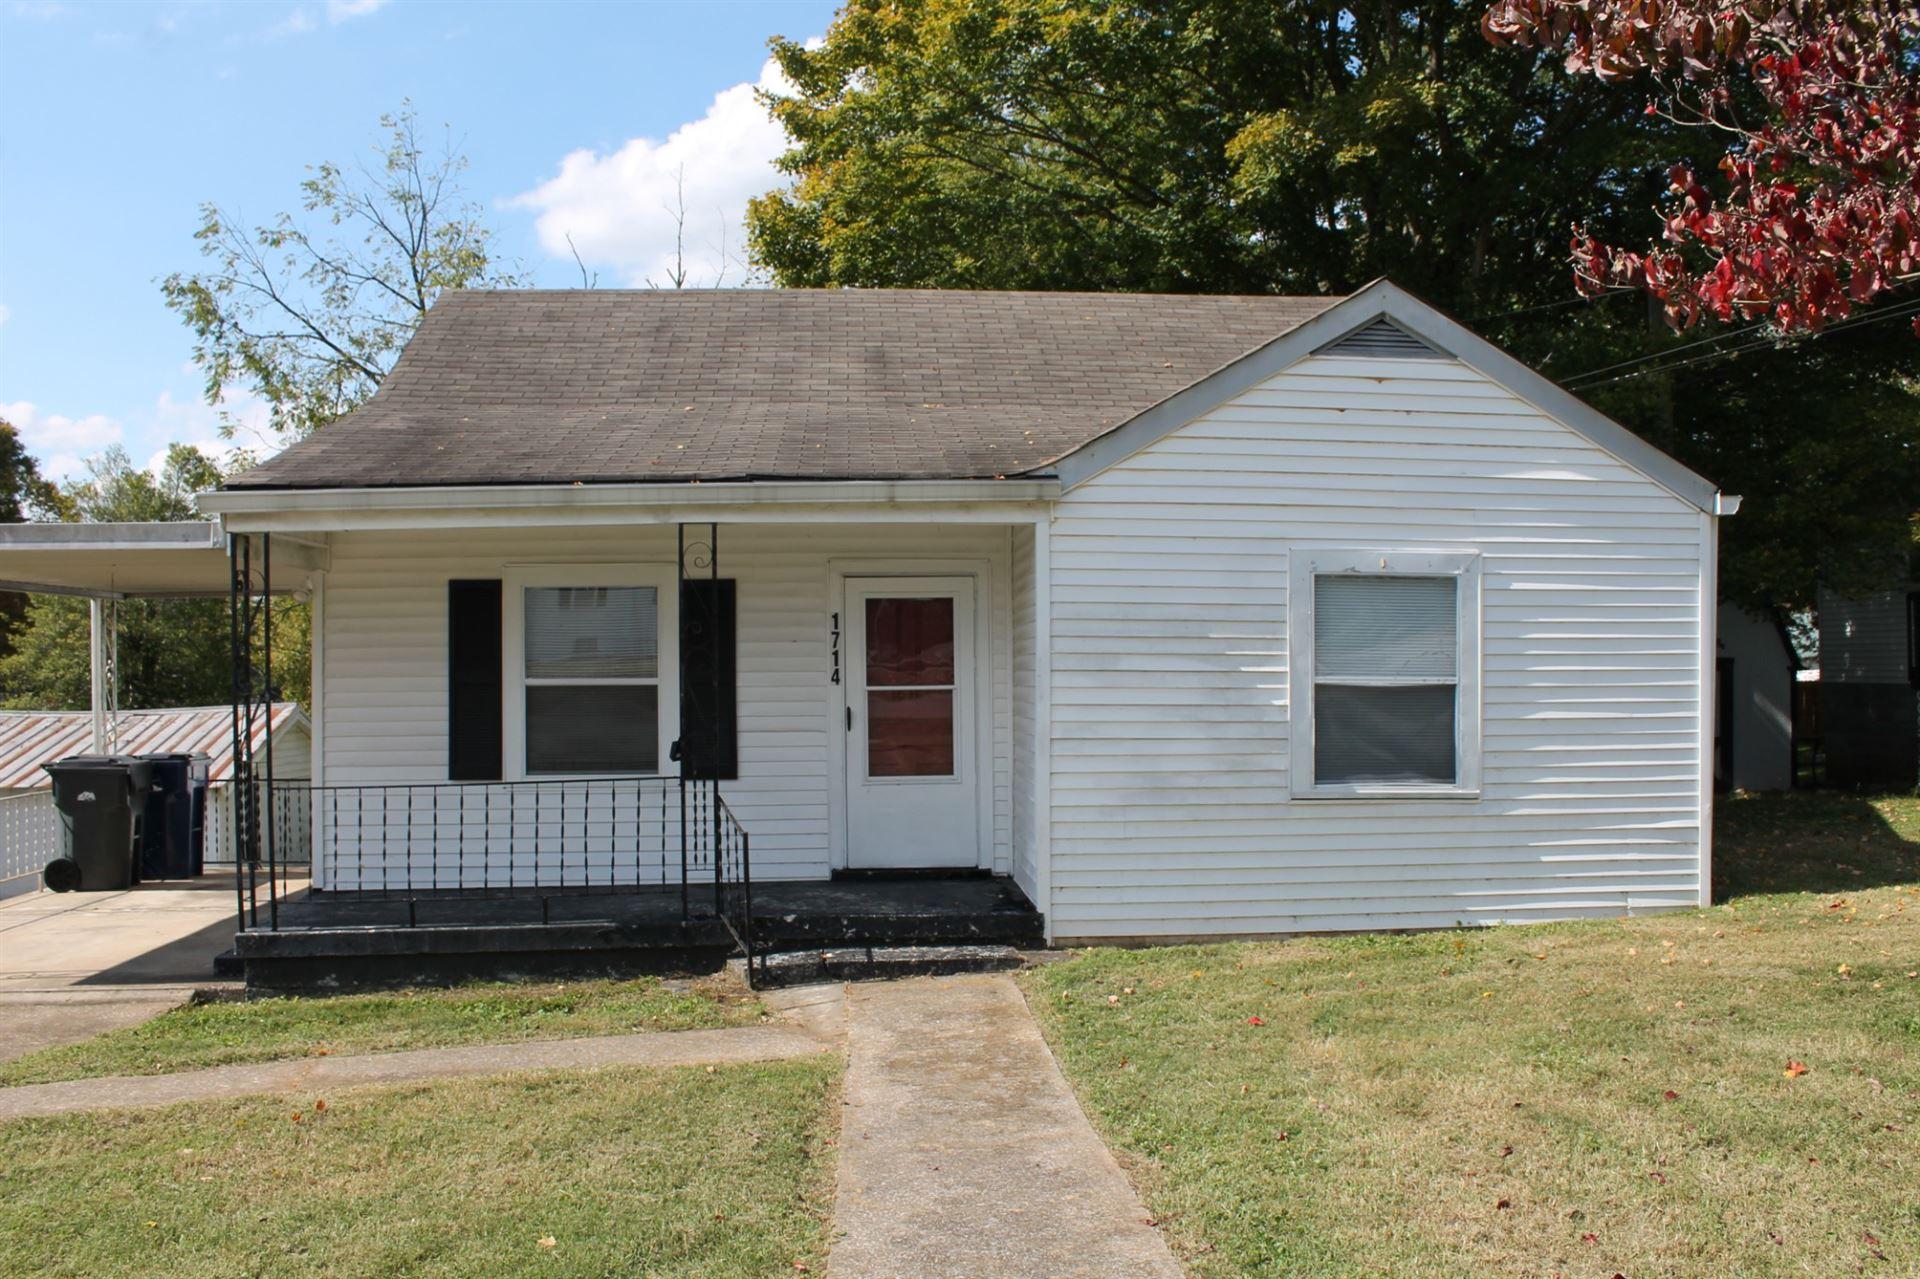 1714 West Ave, Columbia, TN 38401 - MLS#: 2197842